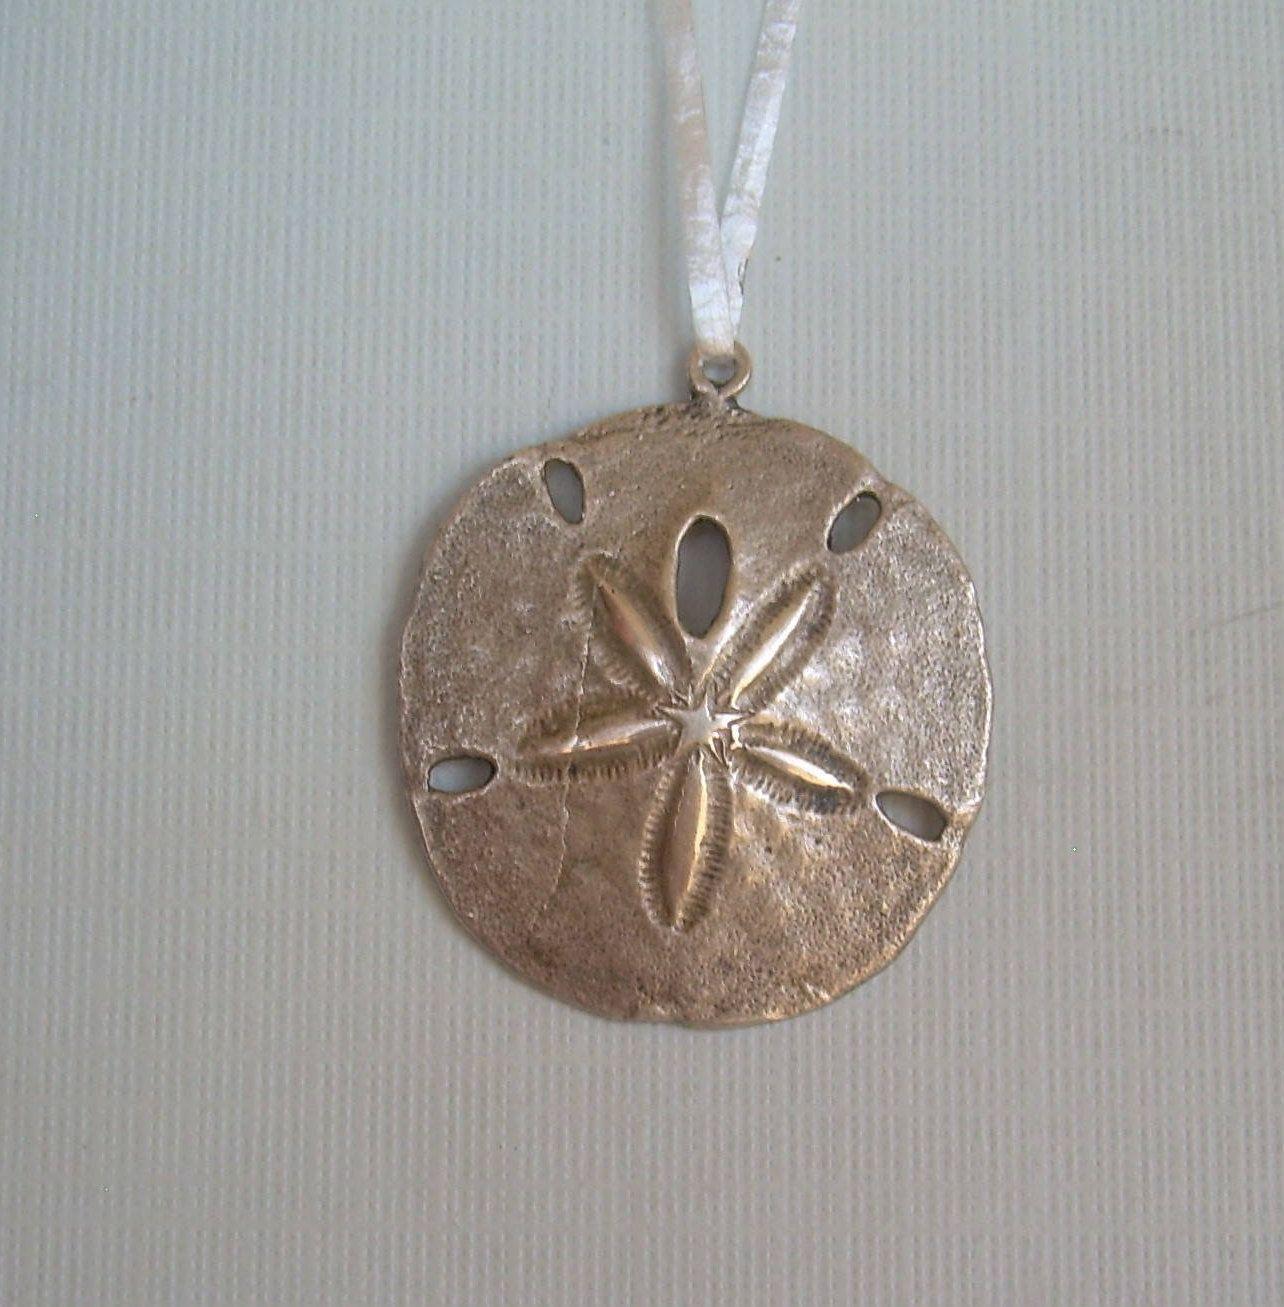 1de3b10f3d77 Large Sand Dollar Pendant Charm-Vintage Solid Sterling Silver-J C Ferrara  Hallmark-Nautical Reef Star Sealife Sea Animal Beach Jewelry-00685 by ...